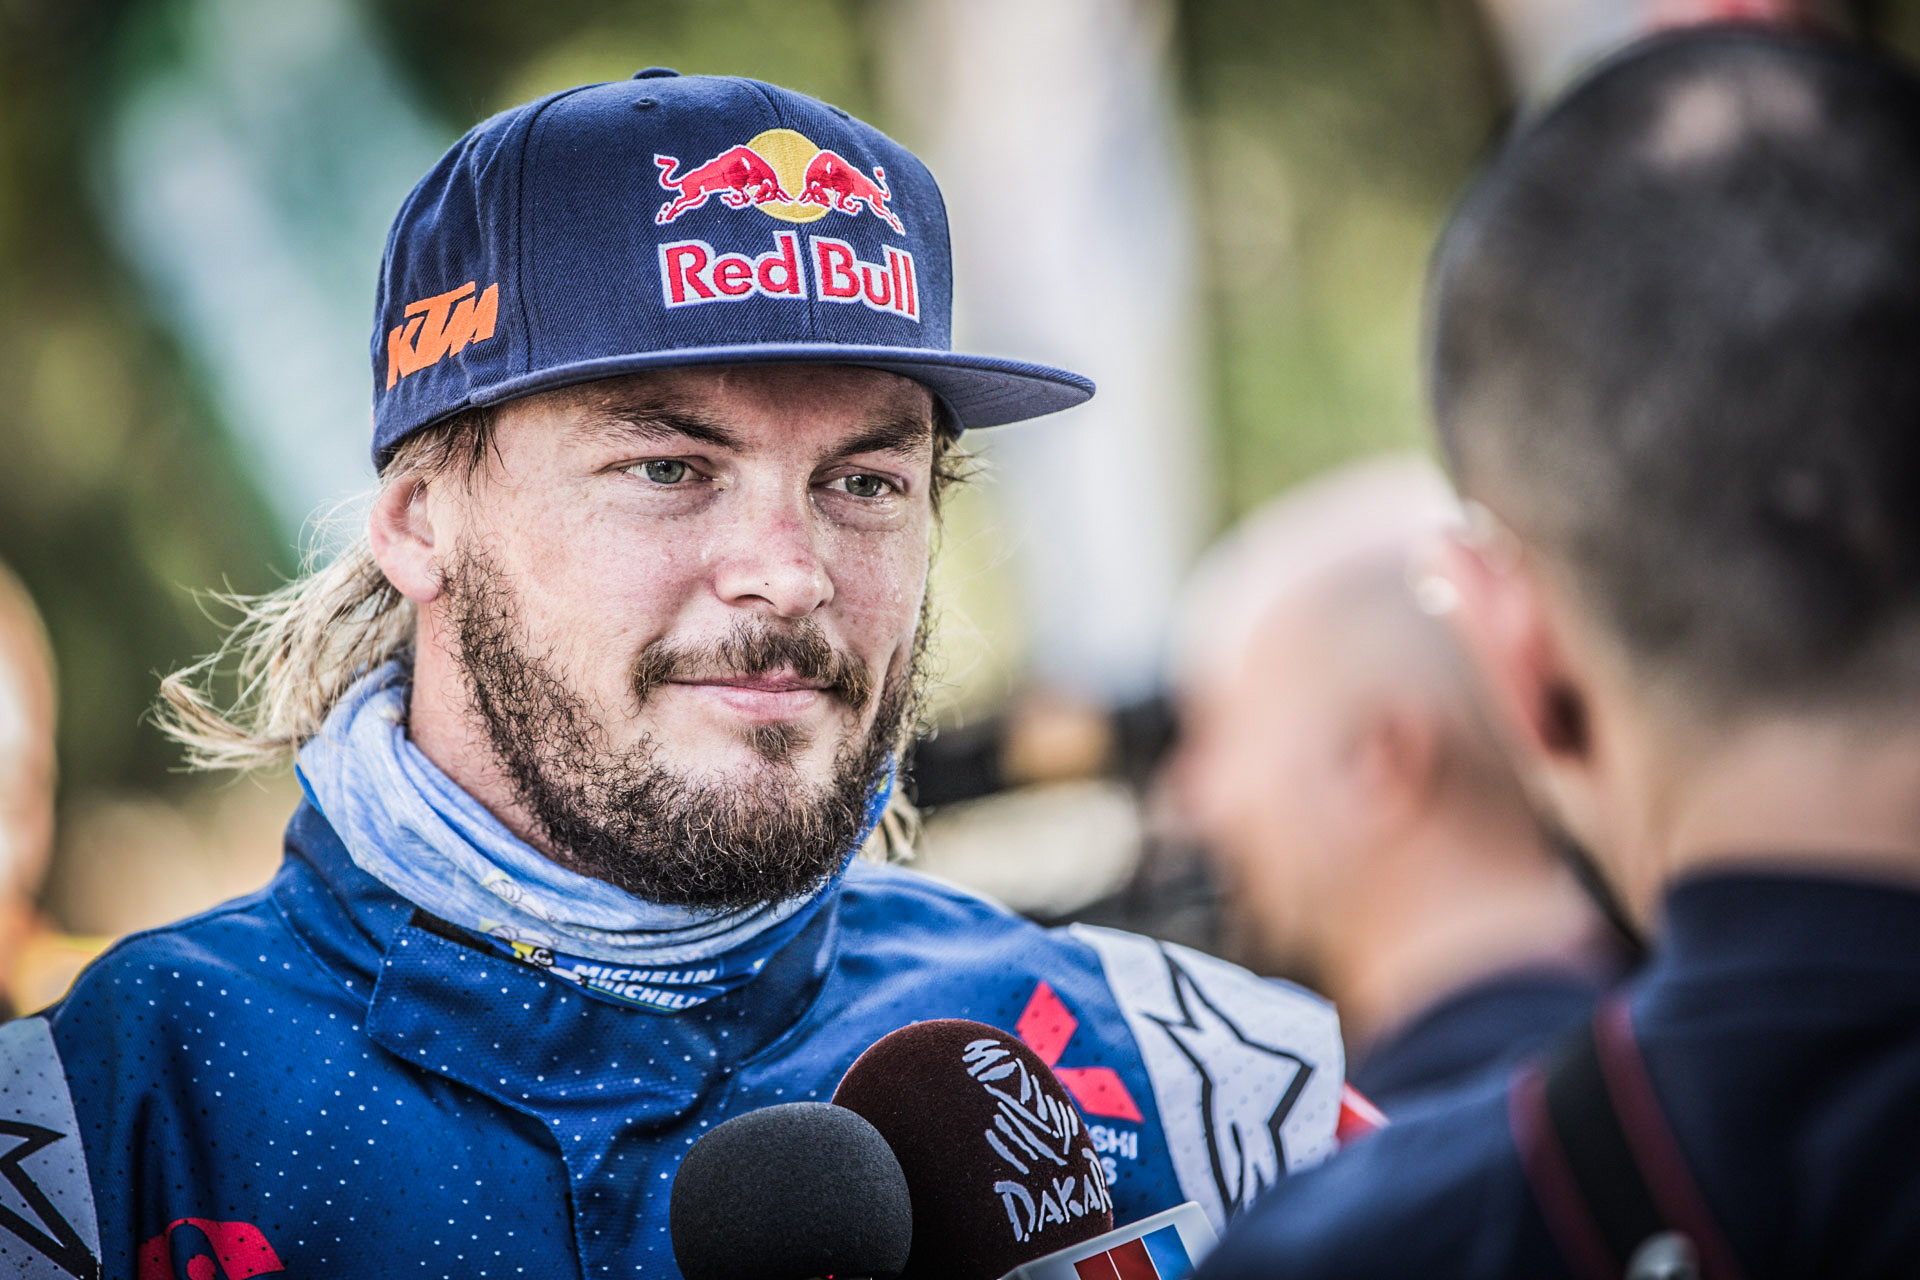 Toby Price Dakar 2017.jpg